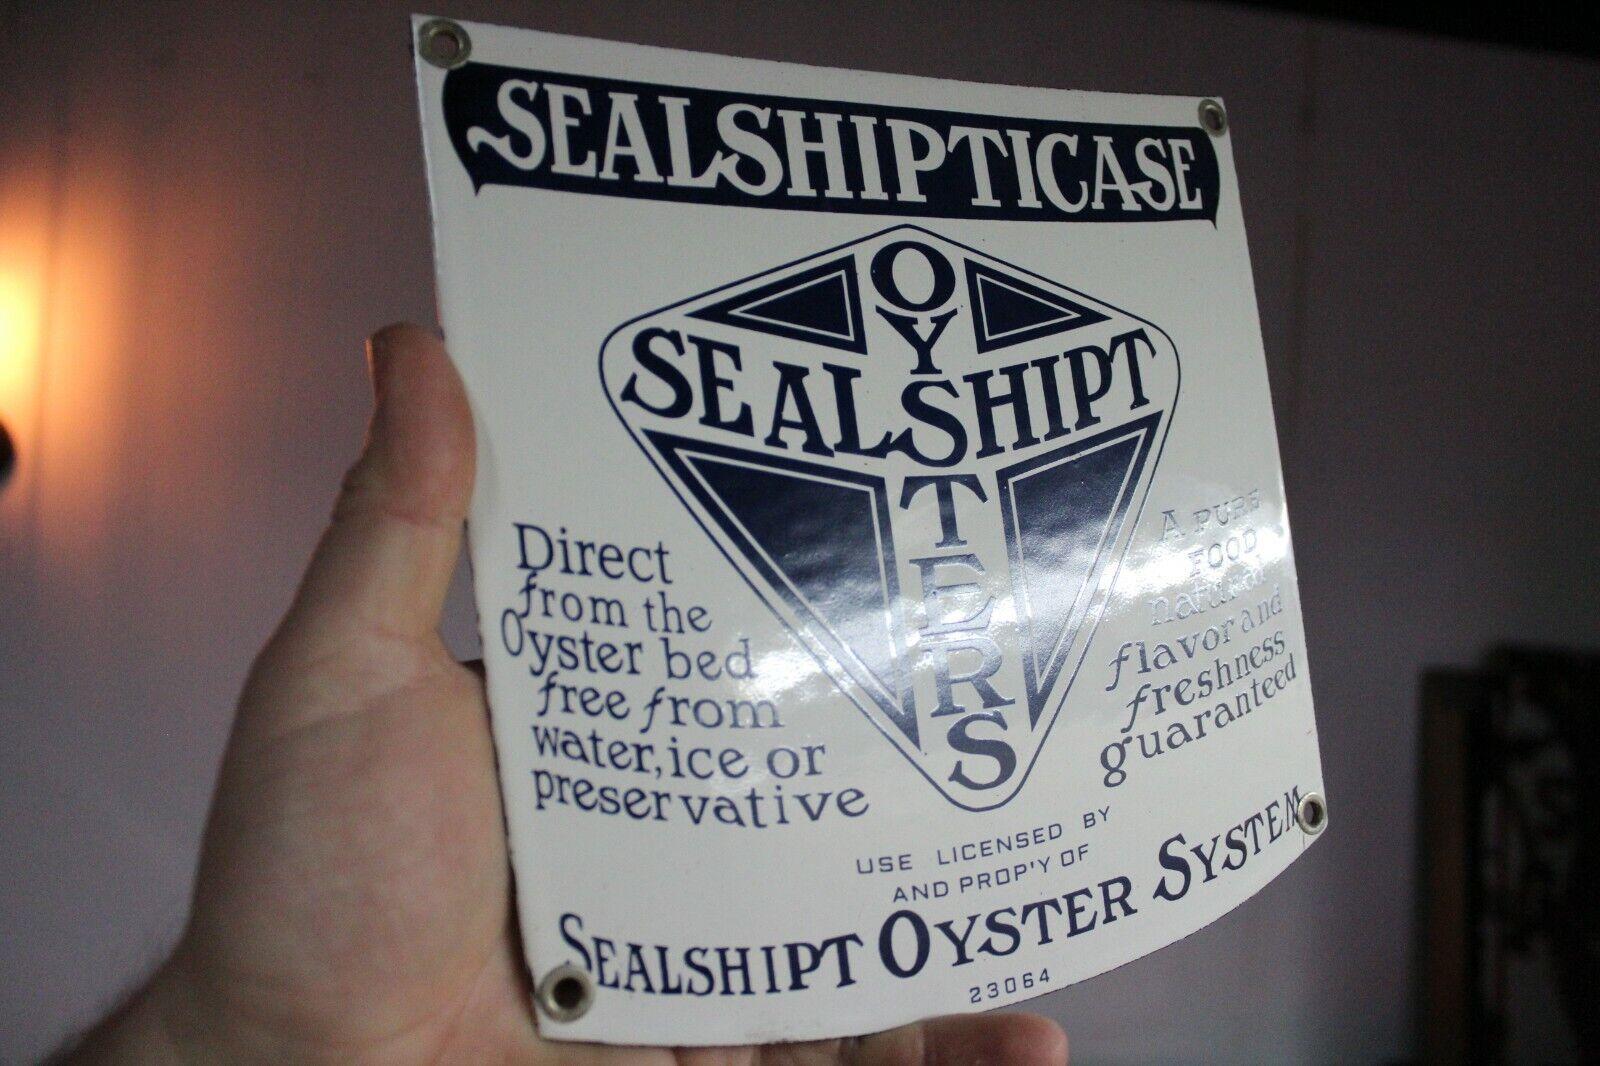 OYSTERS SEALSHIPT SYSTEM PORCELAIN METAL SIGN SEA FOOD FISHING CASE MARINE BOAT - $37.00